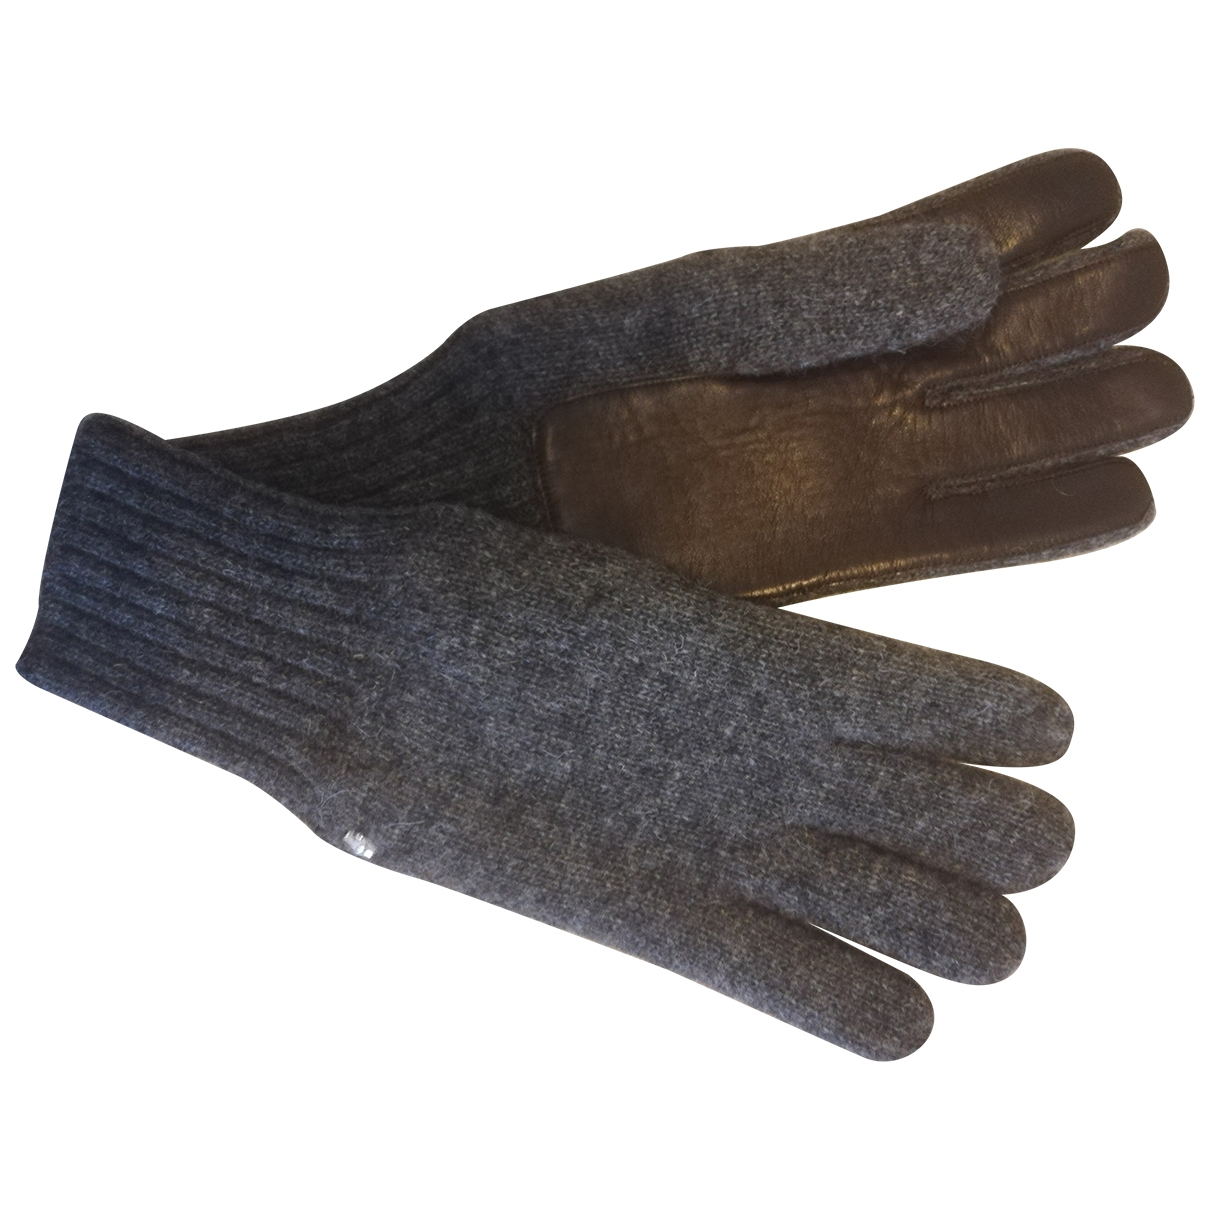 Class Cavalli \N Handschuhe in  Grau Wolle